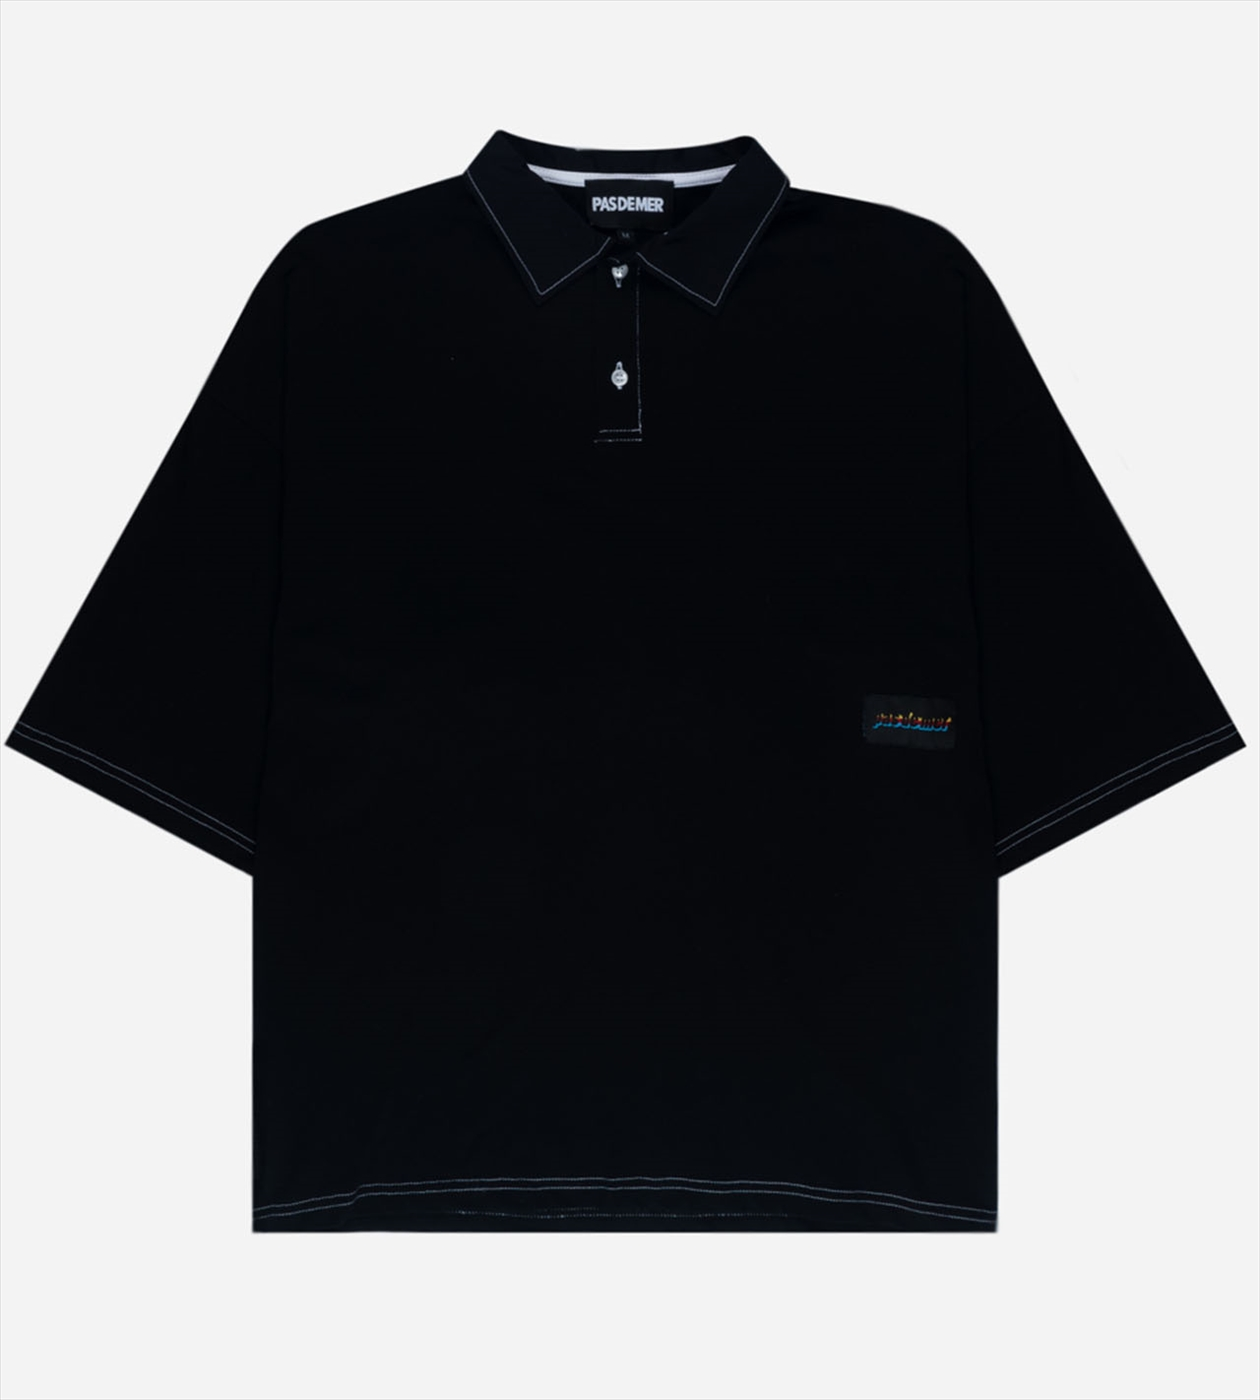 【PAS DE MER/パドゥメ】HOLIDAY POLO ポロシャツ / BLACK